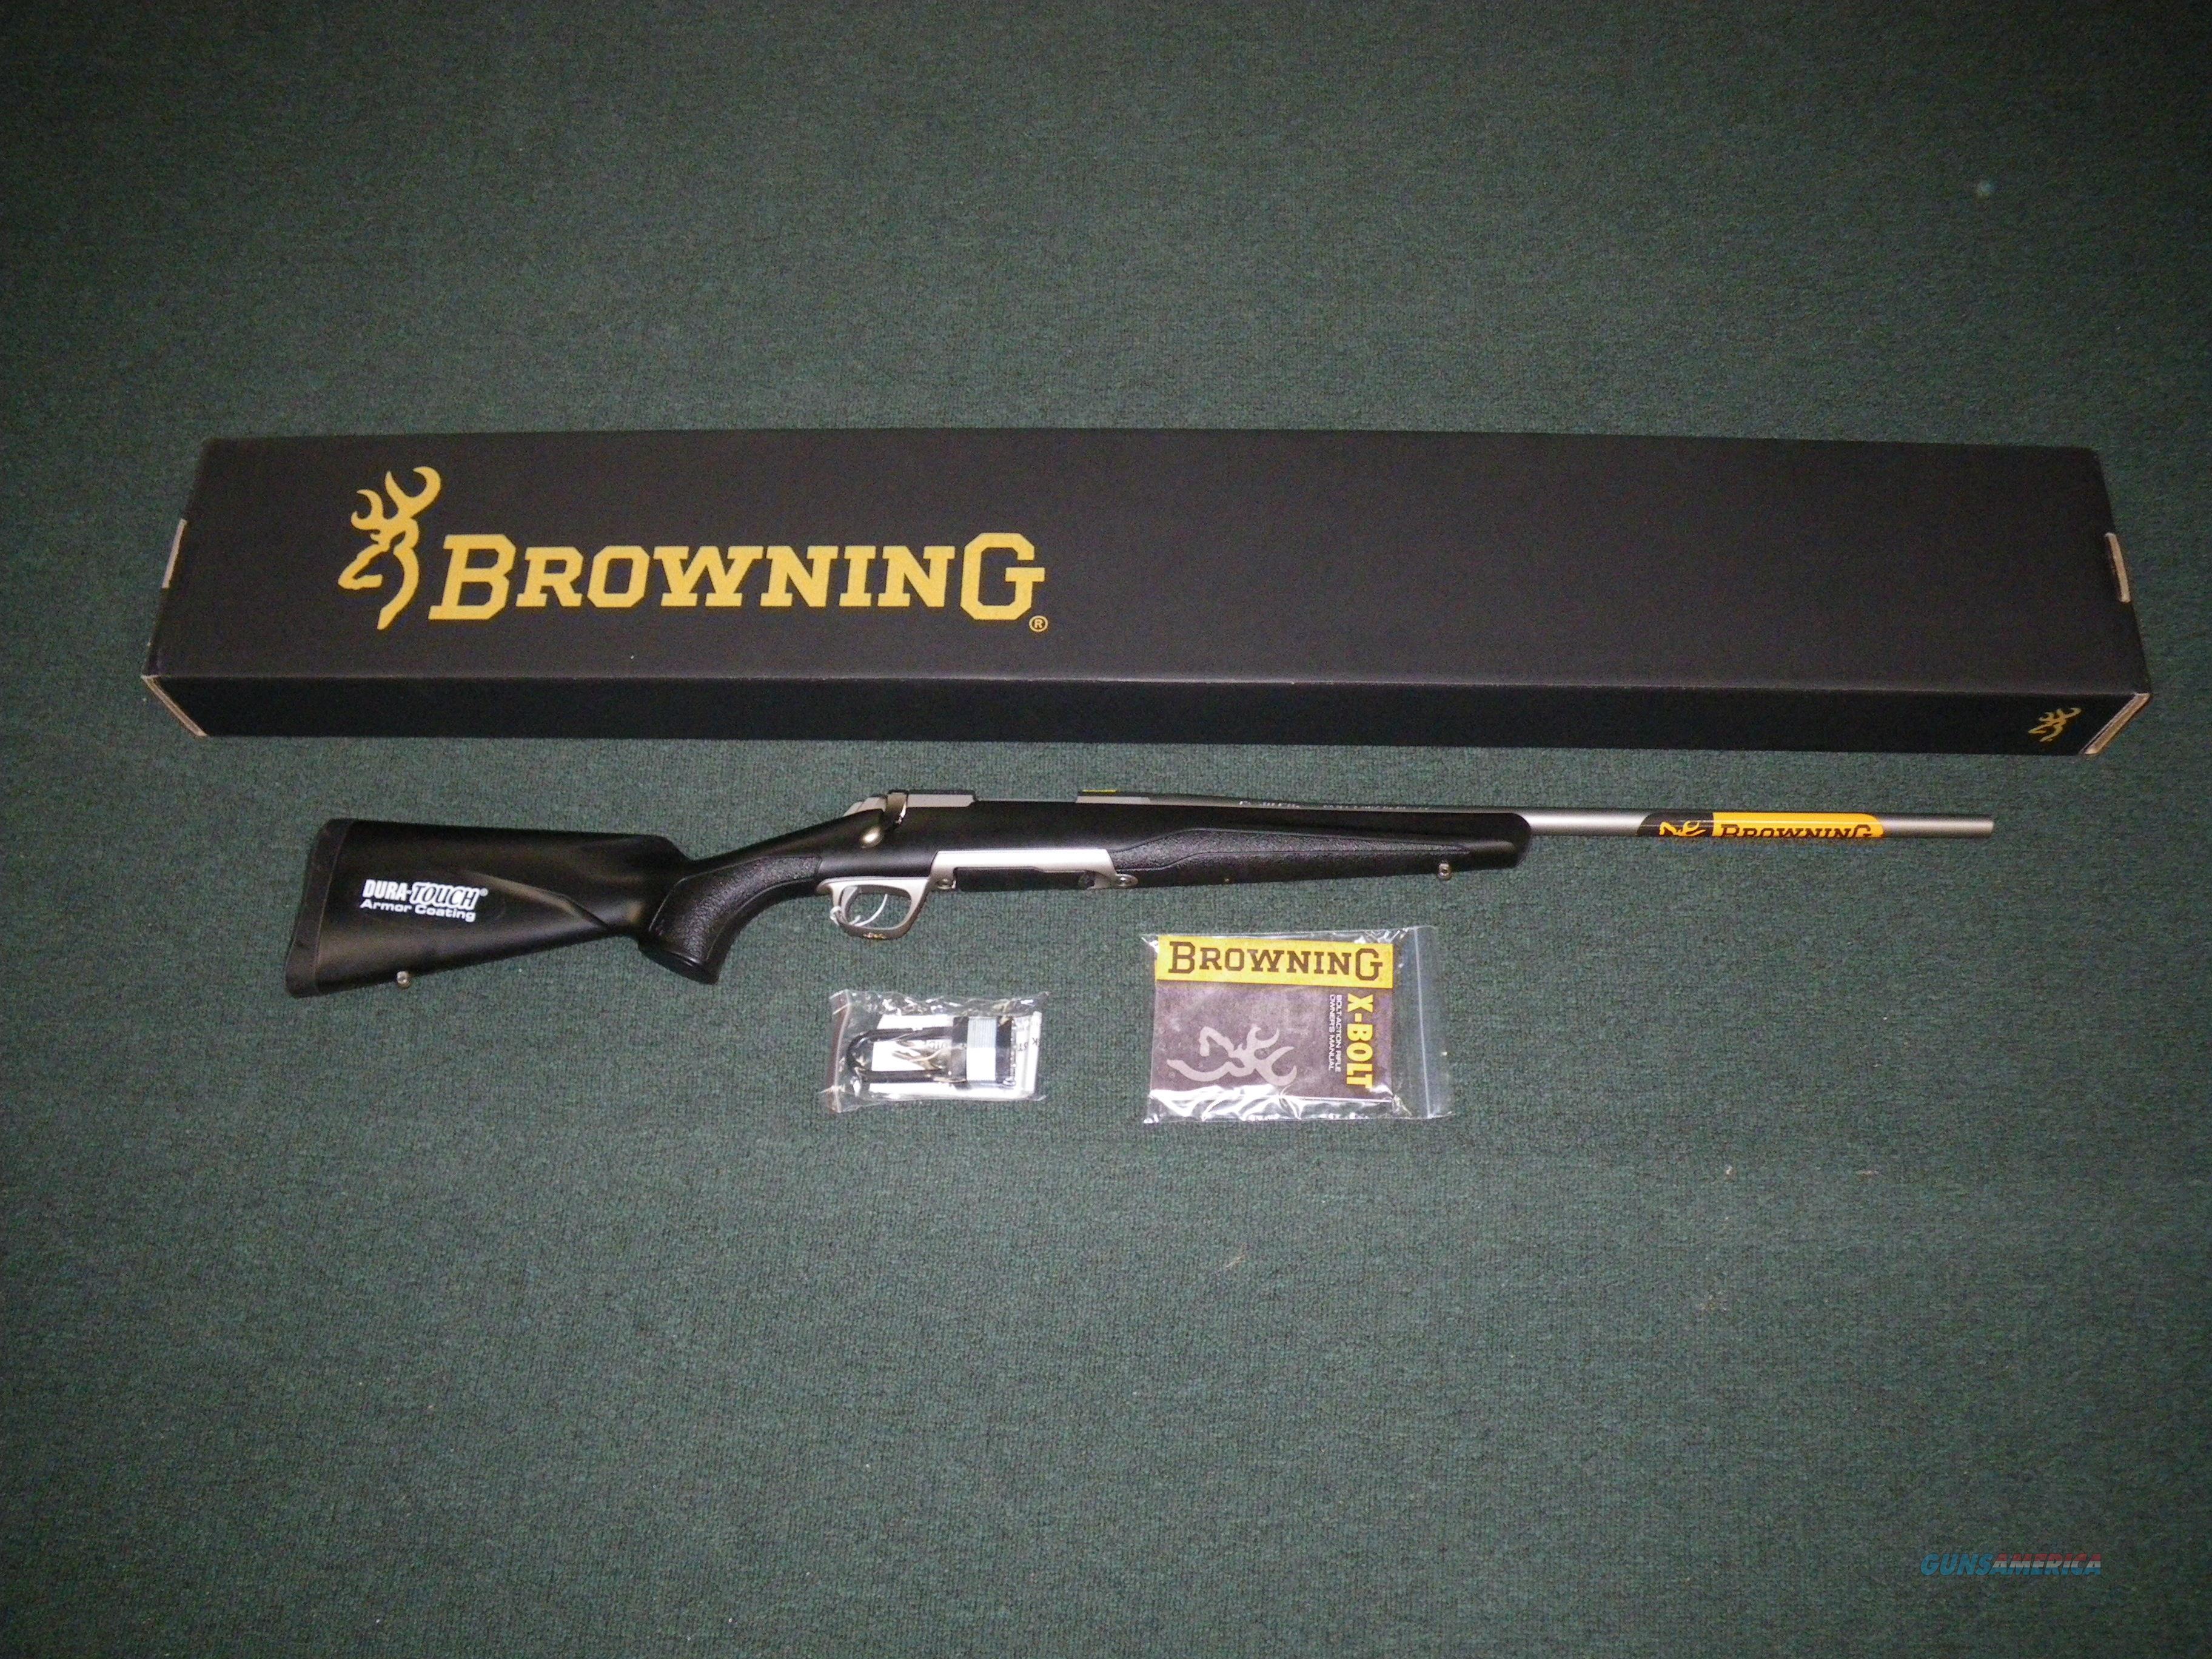 "Browning X-Bolt Stainless Stalker 308 Win 22"" NIB #035202218  Guns > Rifles > Browning Rifles > Bolt Action > Hunting > Stainless"